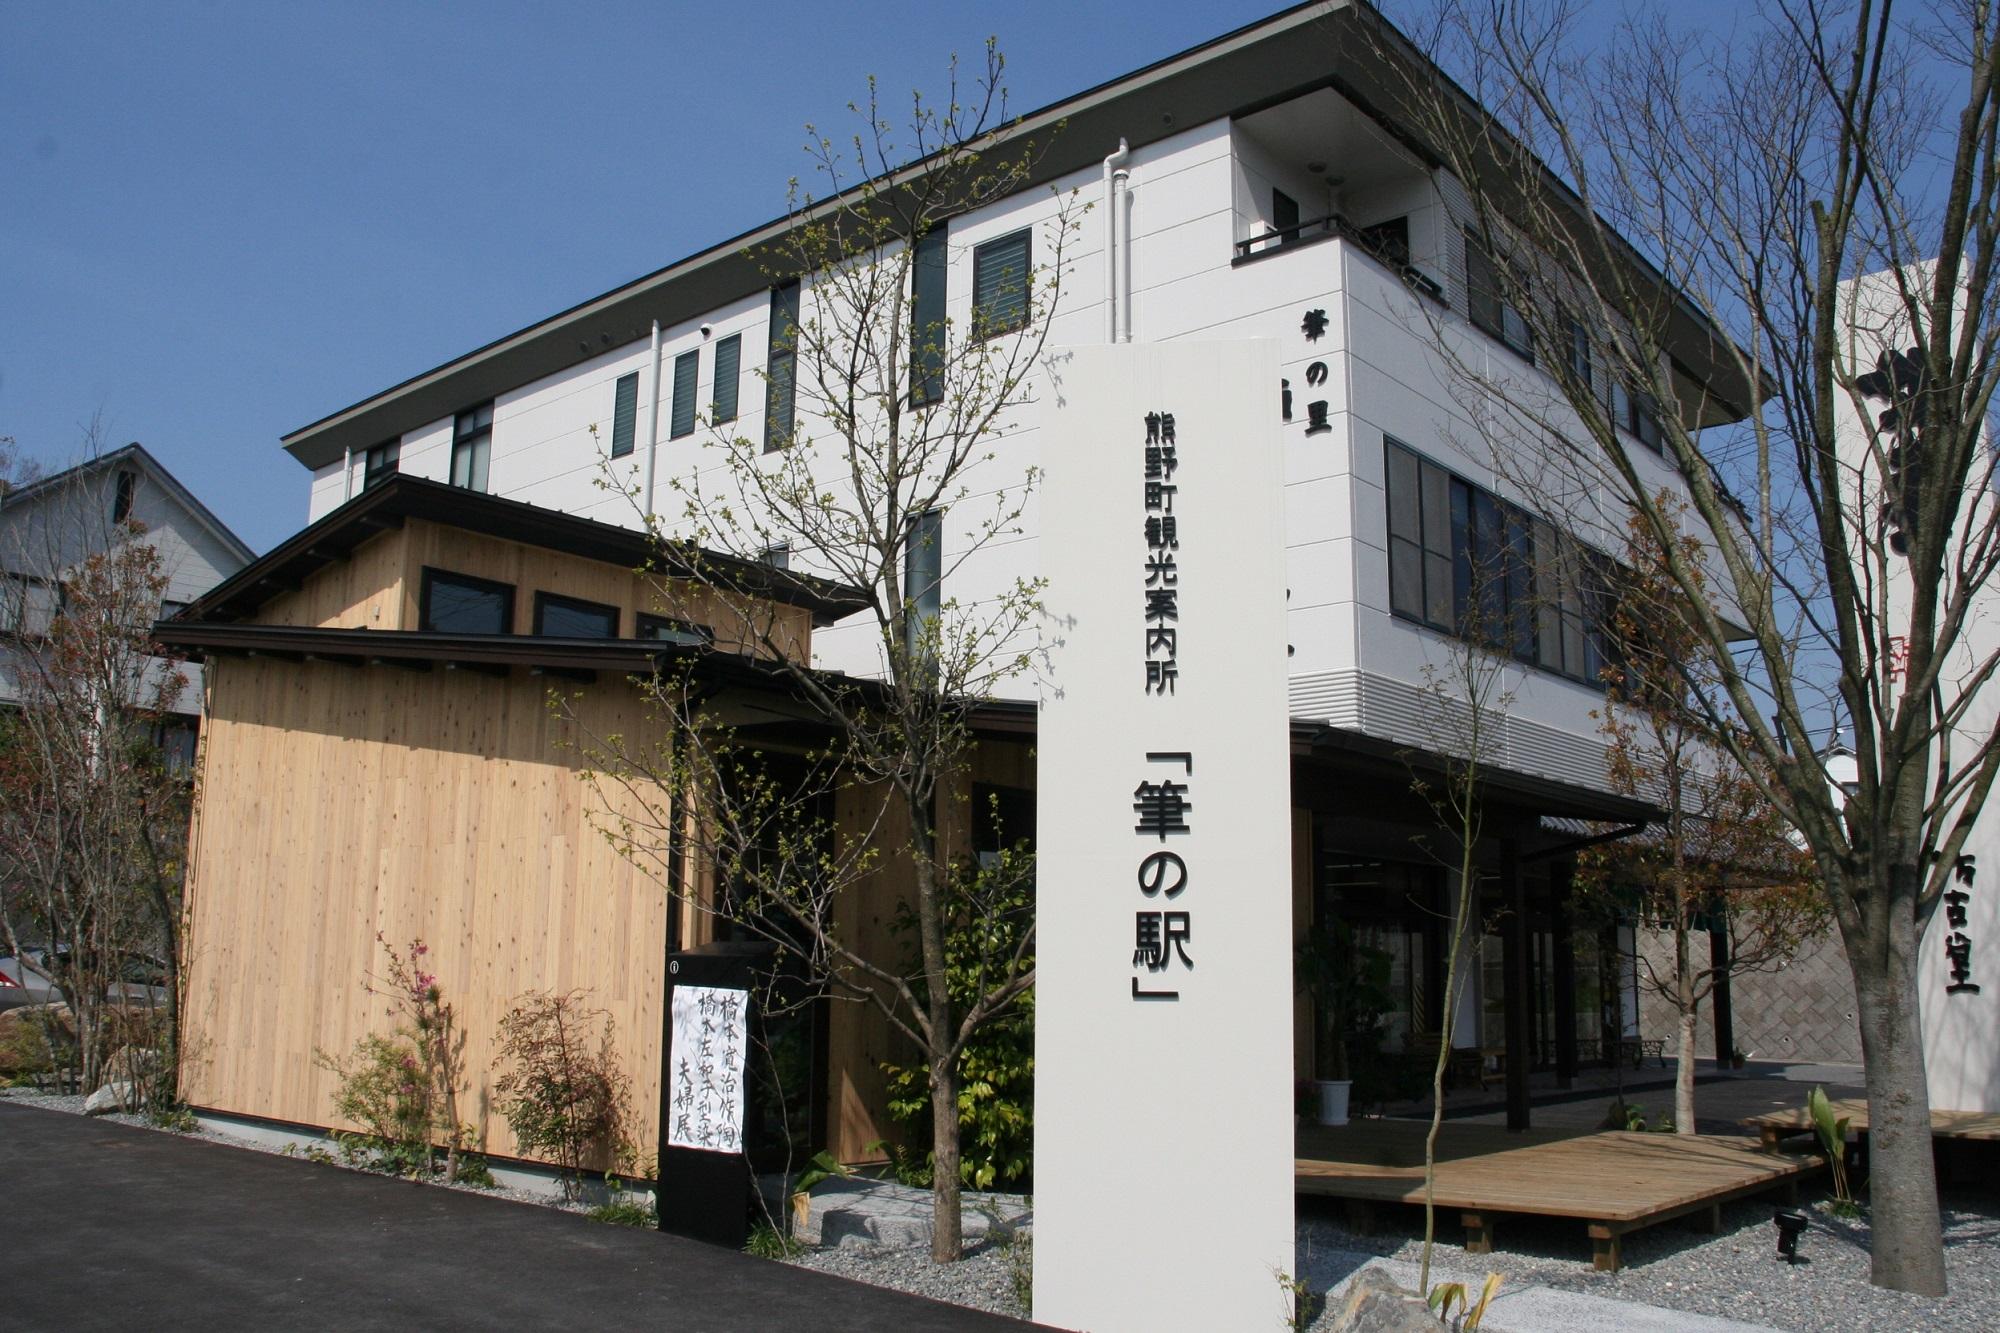 熊野町観光案内所「筆の駅」(熊野町)